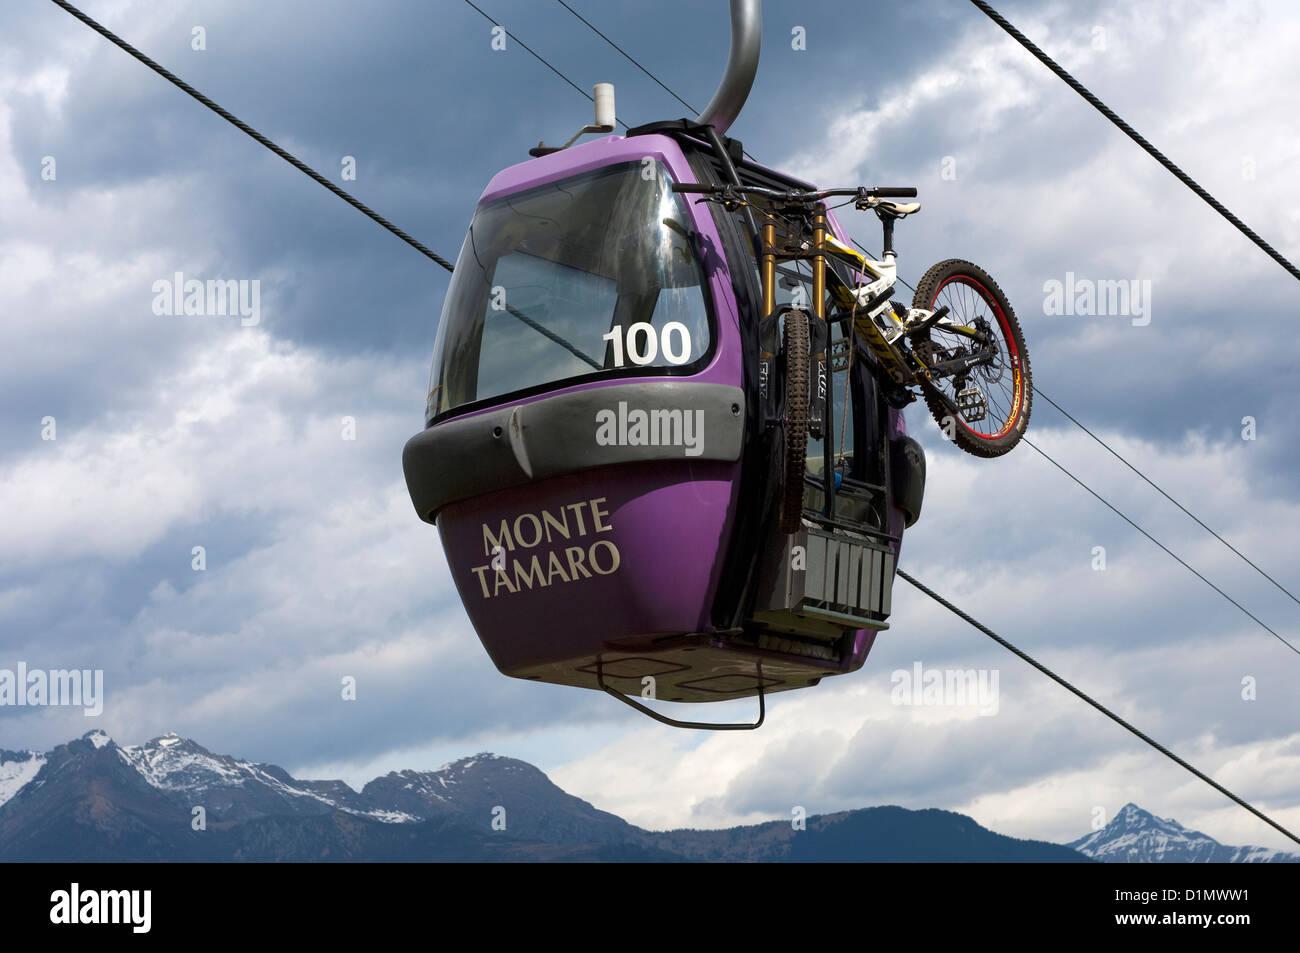 Transport of mountain bikes to the Bike Park Monte Tamaro from Rivera, Ticino, Switzerland - Stock Image